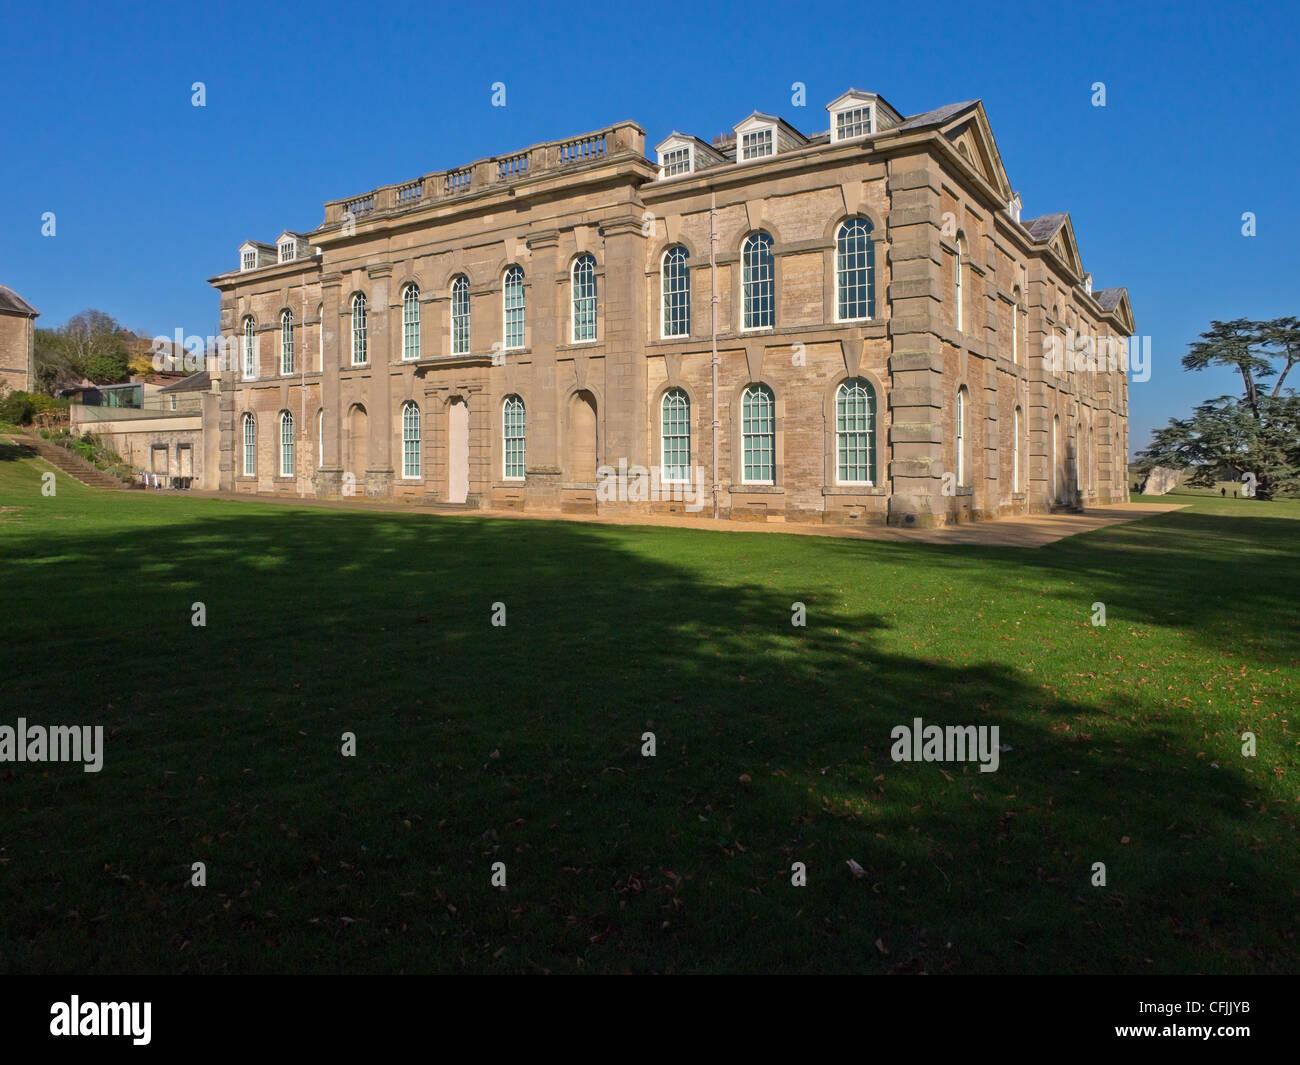 Compton Verney stately home, Warwickshire, England, United Kingdom, Europe - Stock Image